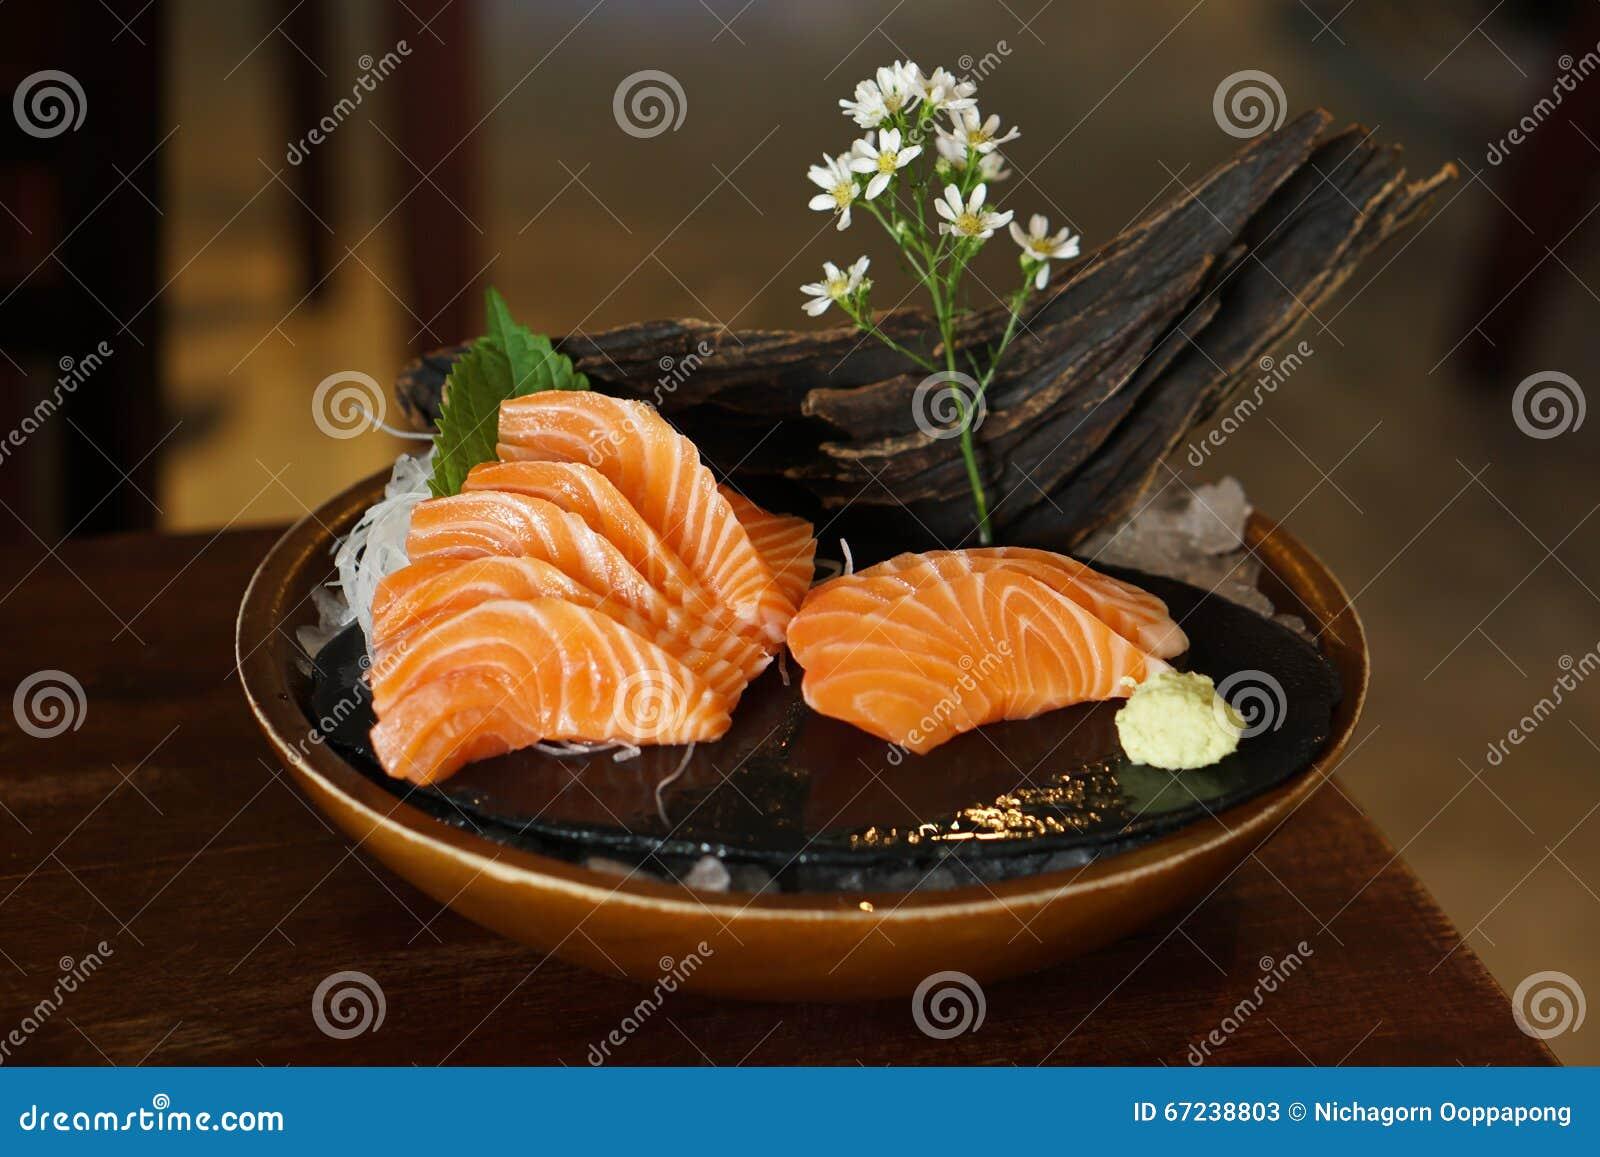 Nourriture japonaise - Salmon Sashimi